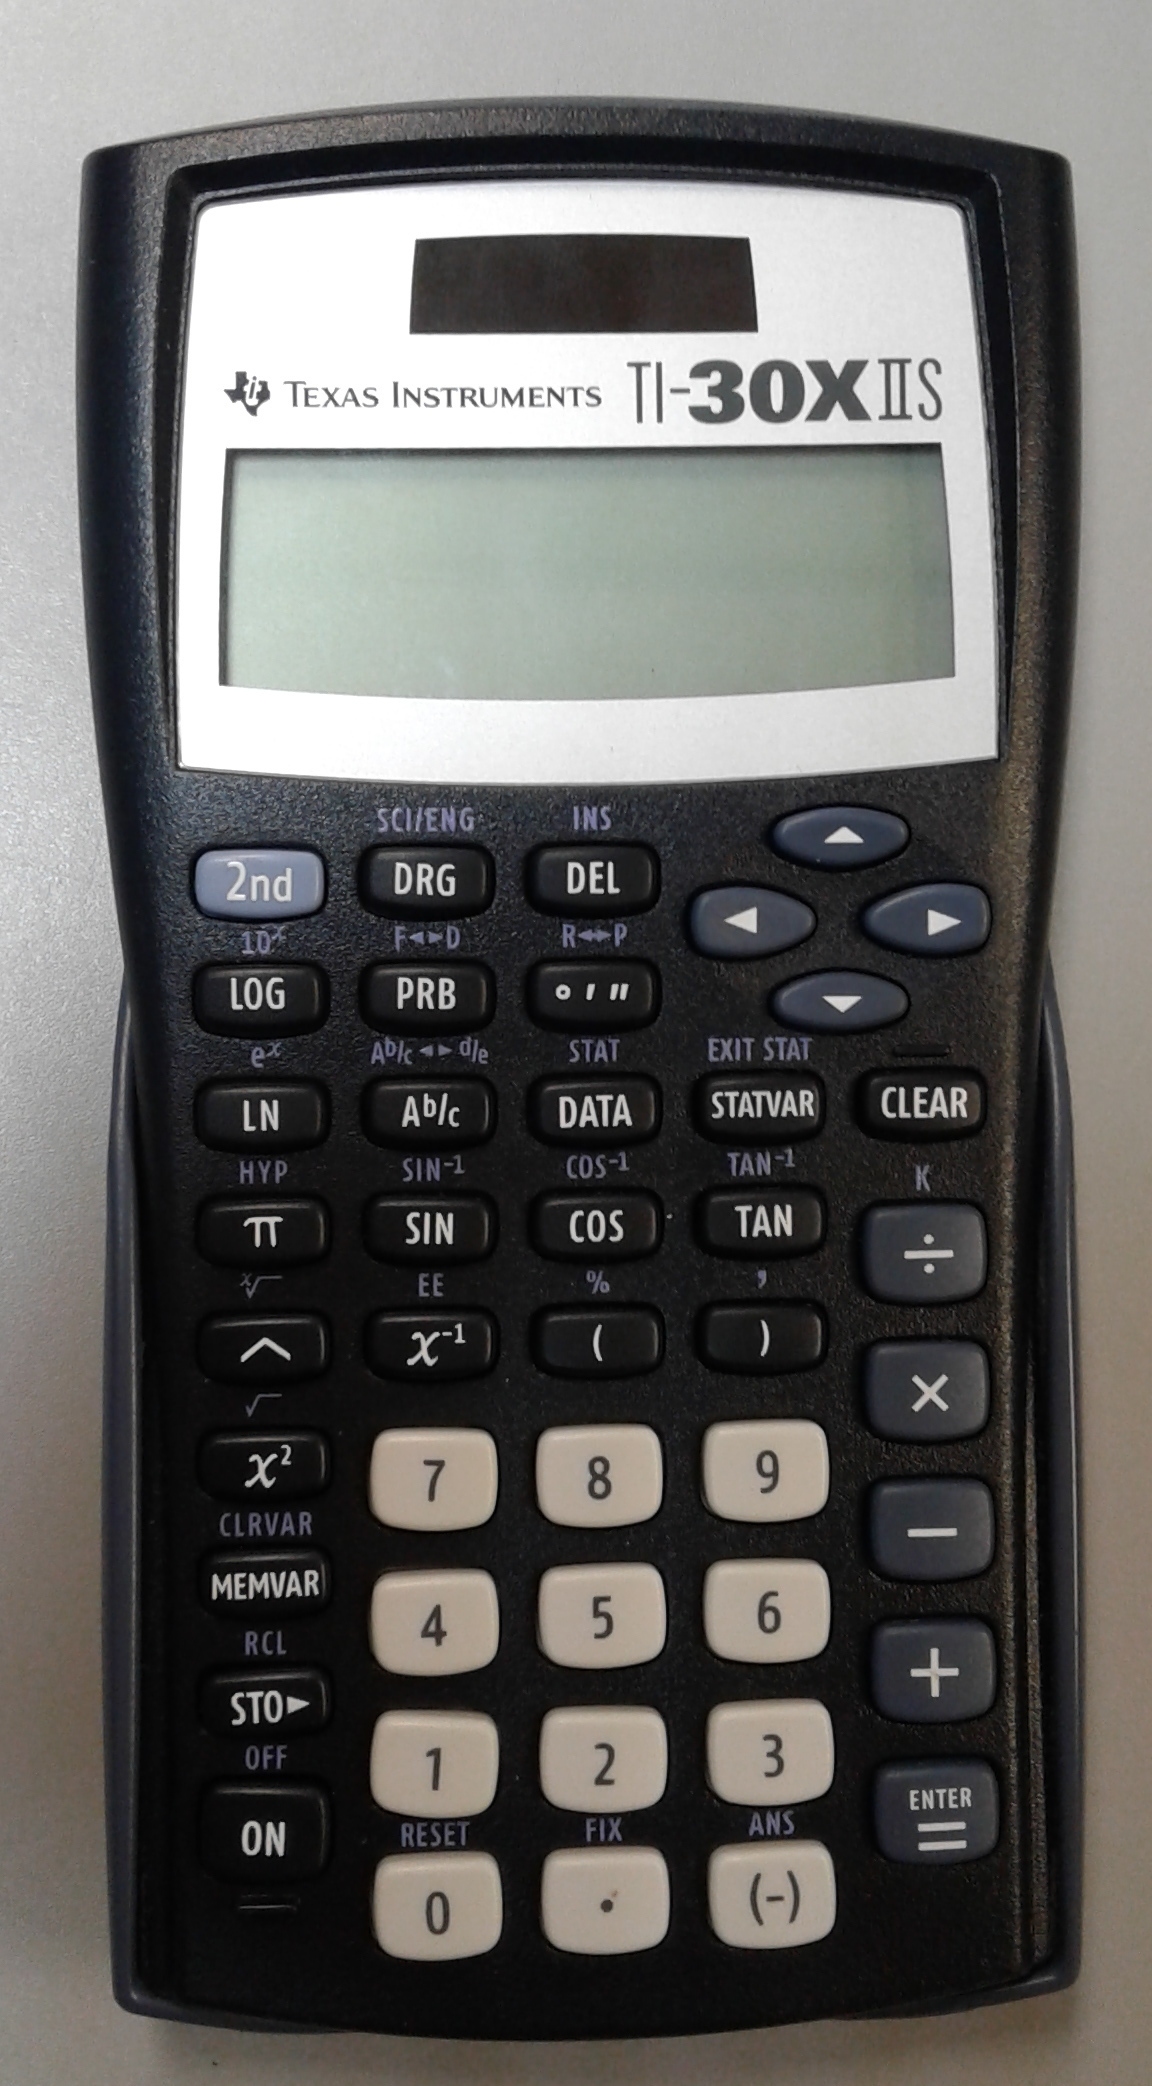 Texas Instruments TI-30XIIS - CALCULATOR